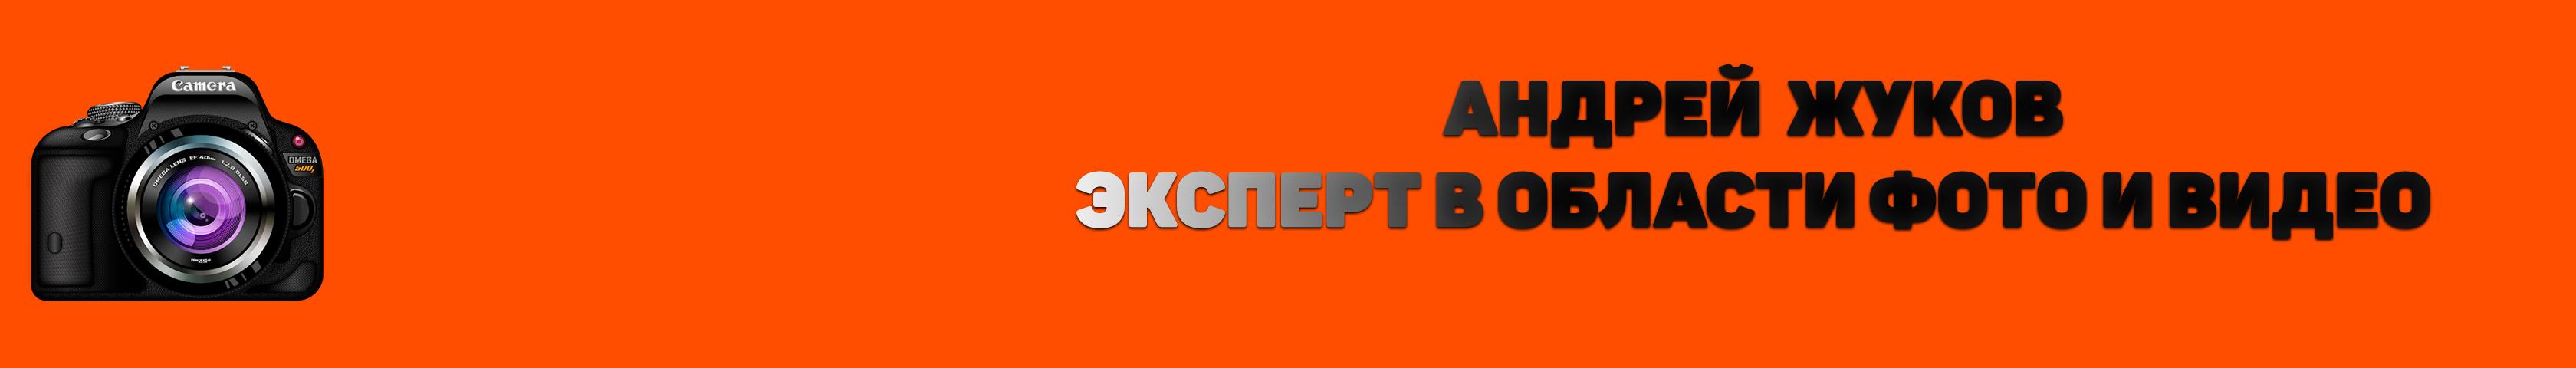 creator cover Андрей Жуков